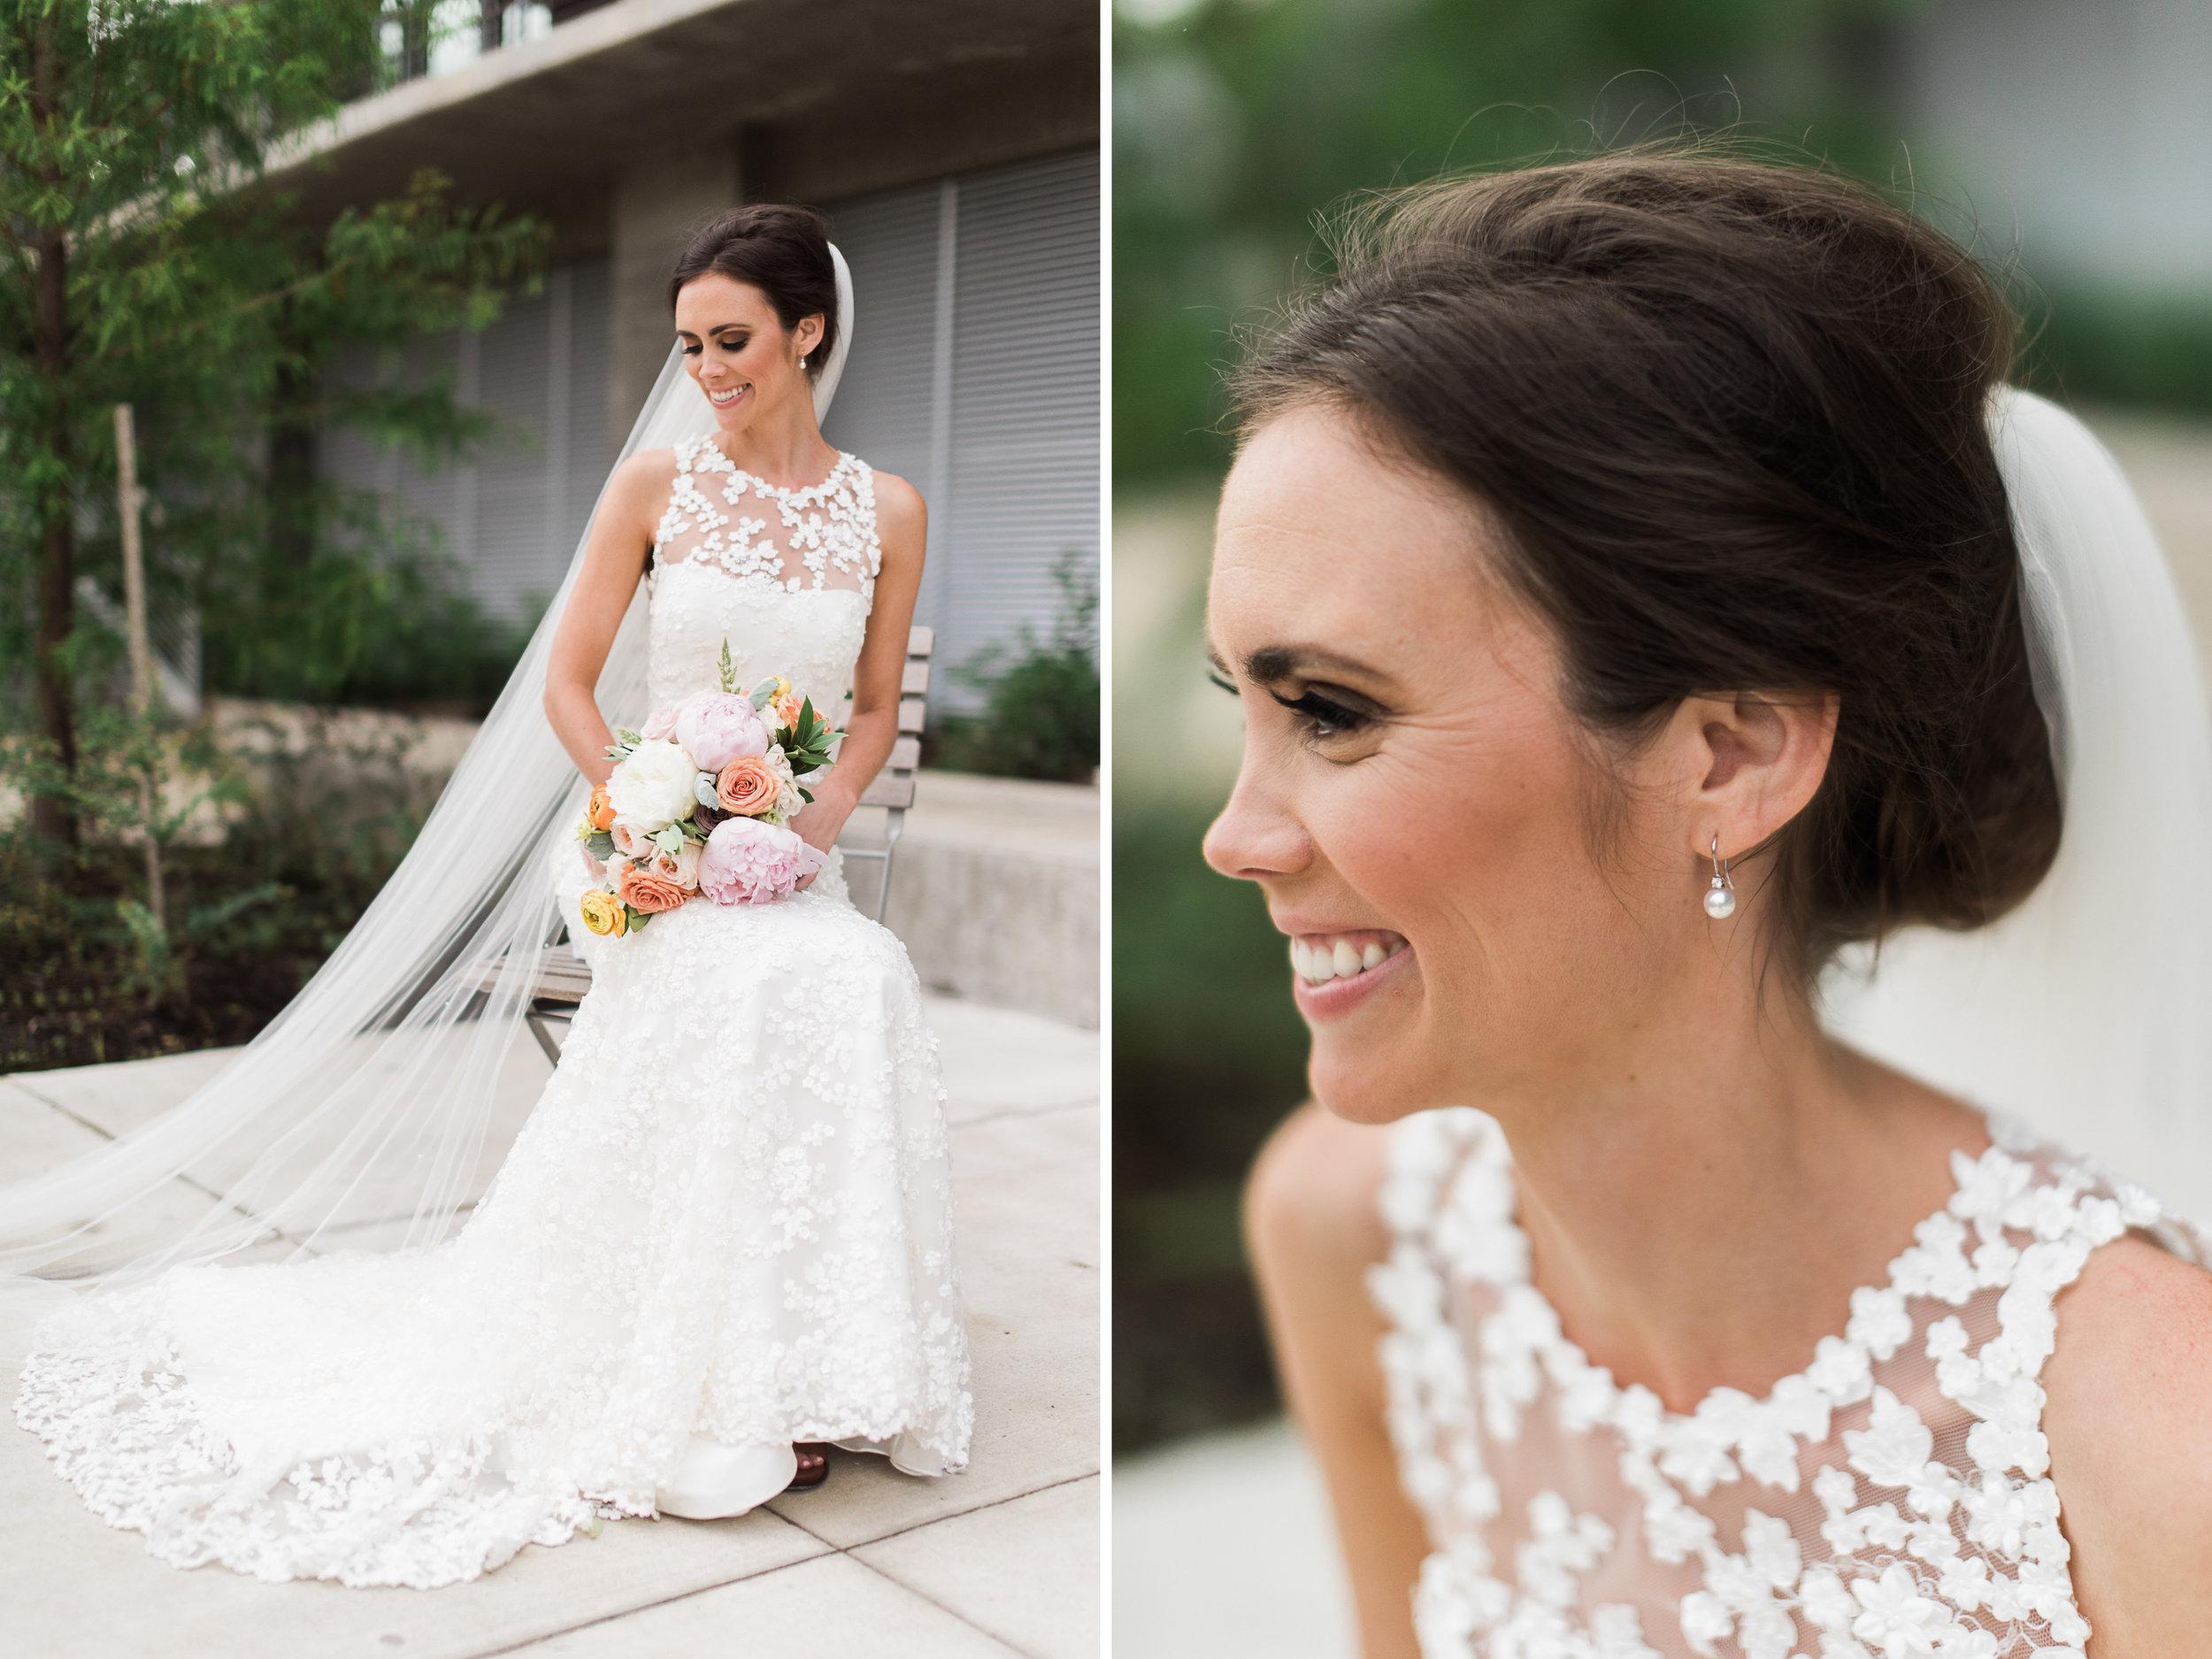 The-Dunlavy-Wedding-Photography-Bridals-Houston-Film-Dana-Fernandez-Photography-Potraits-110.jpg